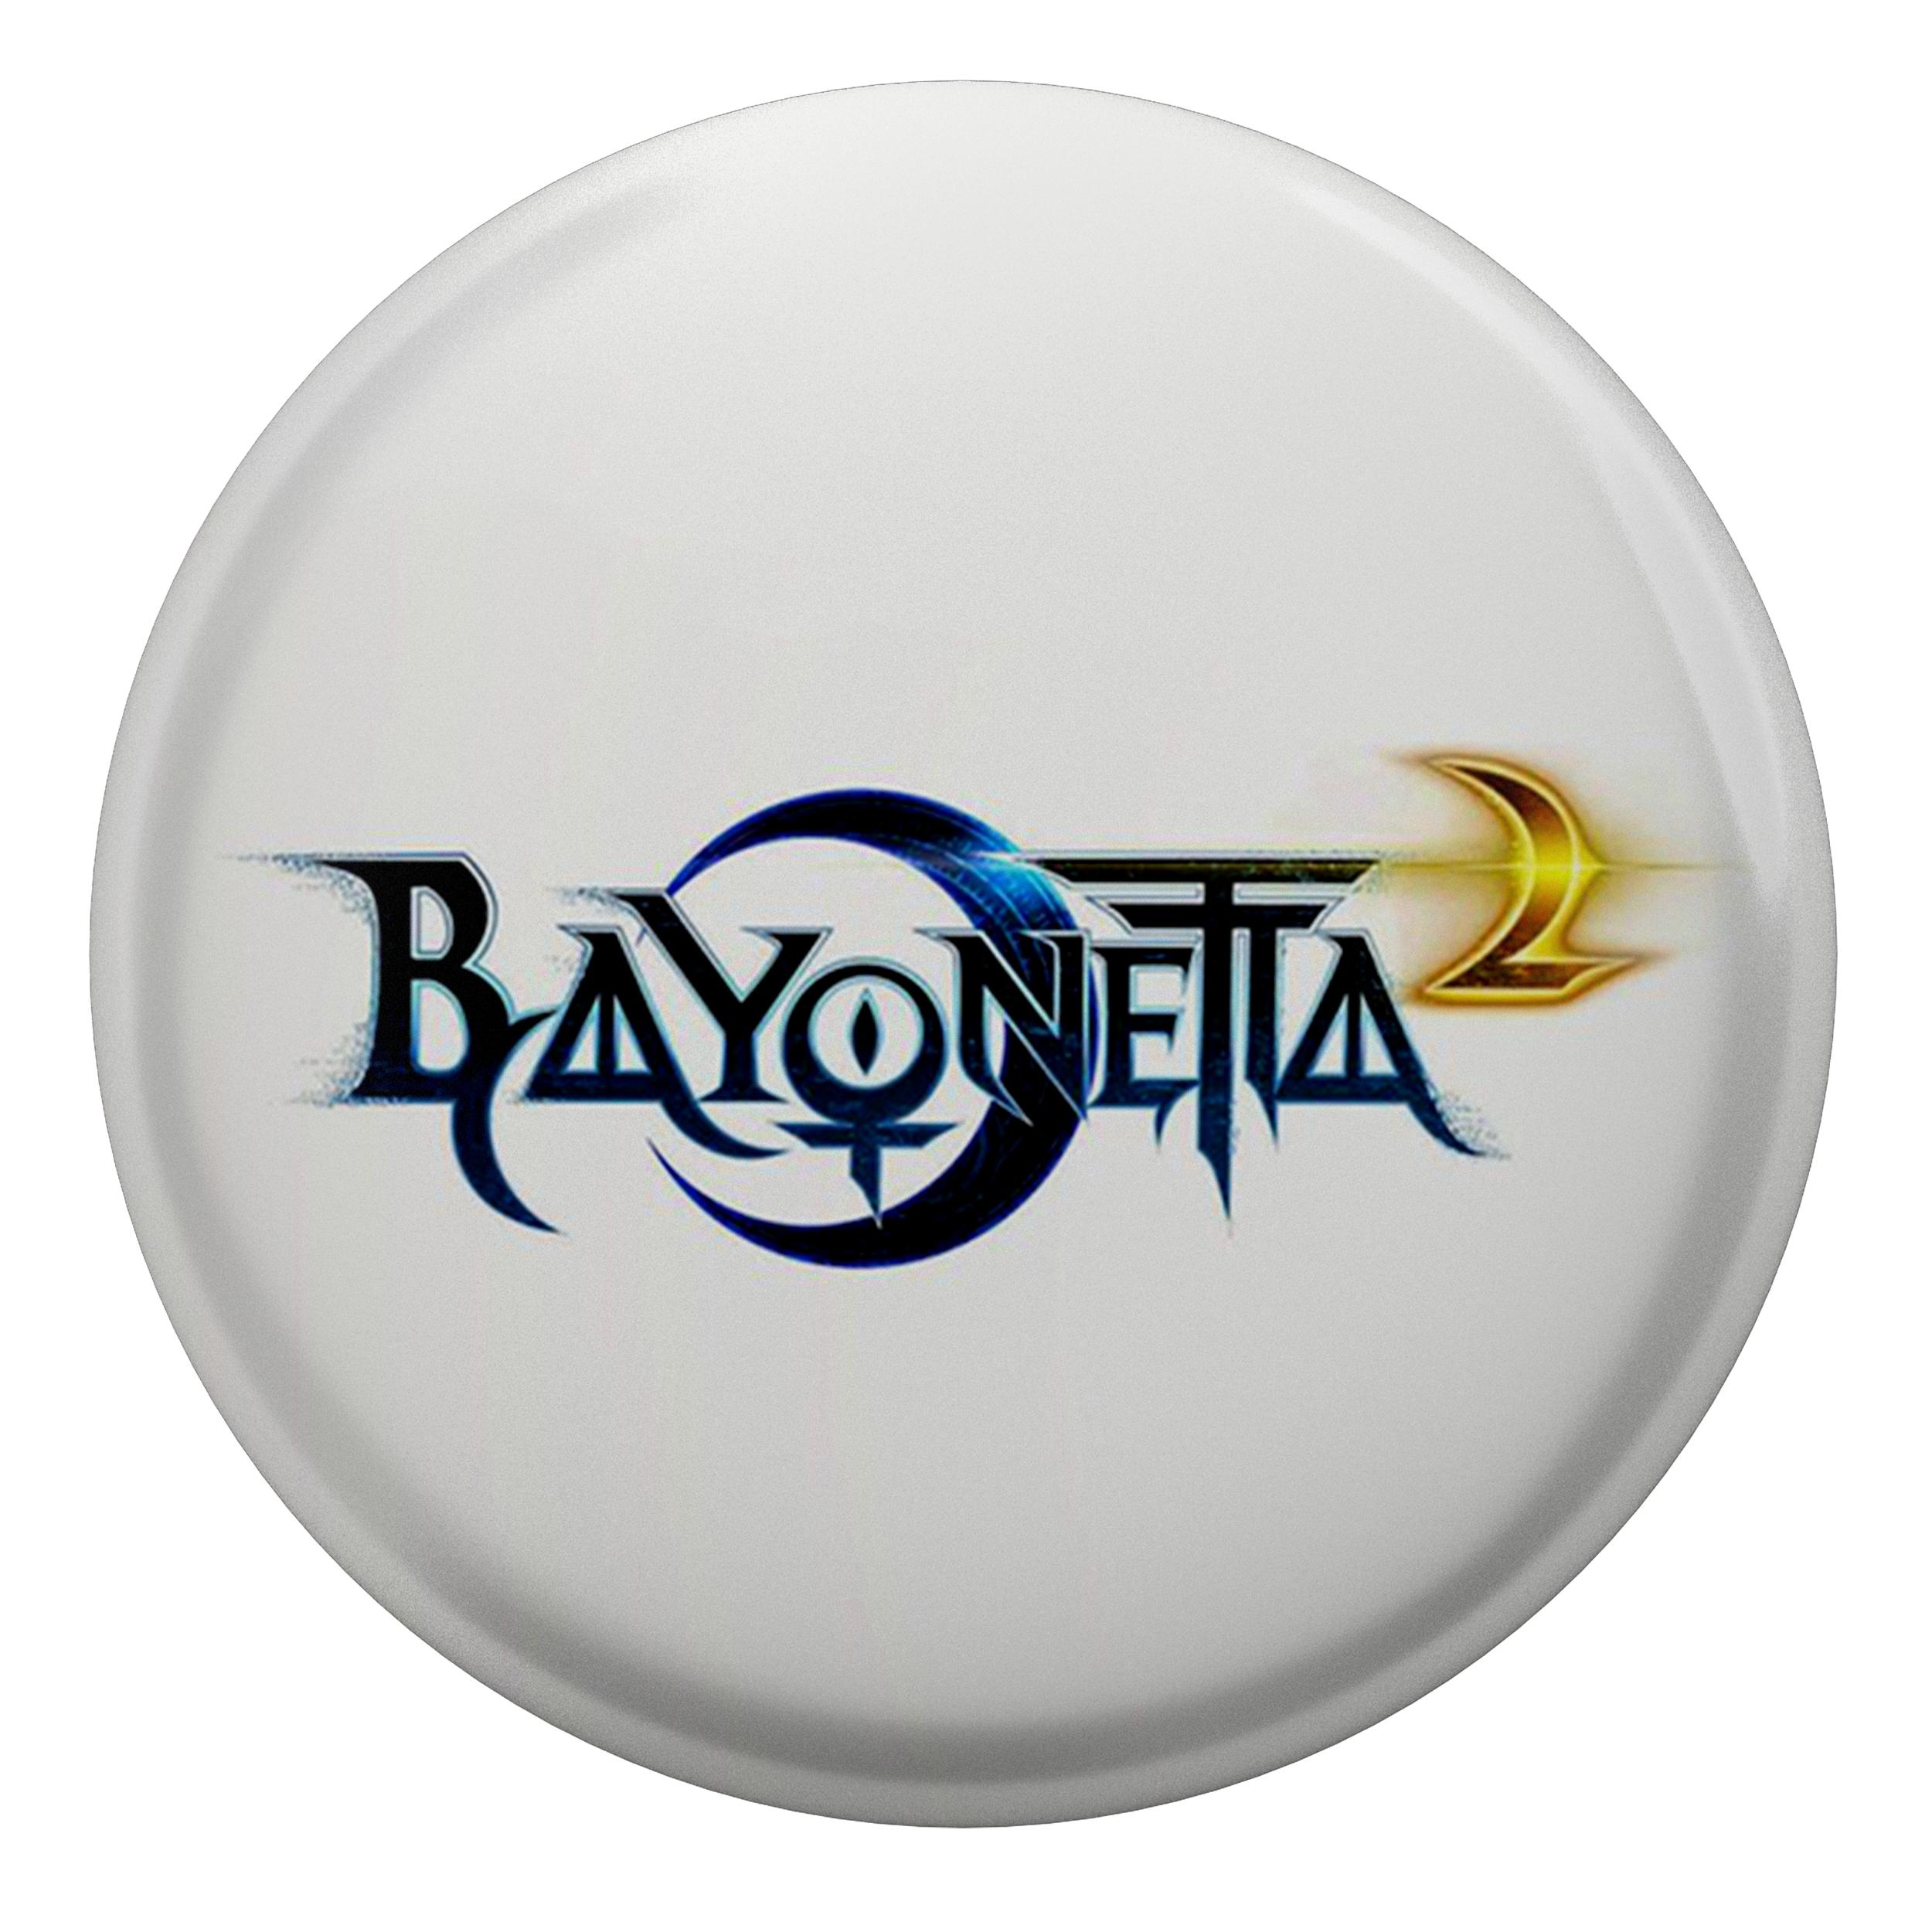 پیکسل طرح BAYONETTA مدل S1834